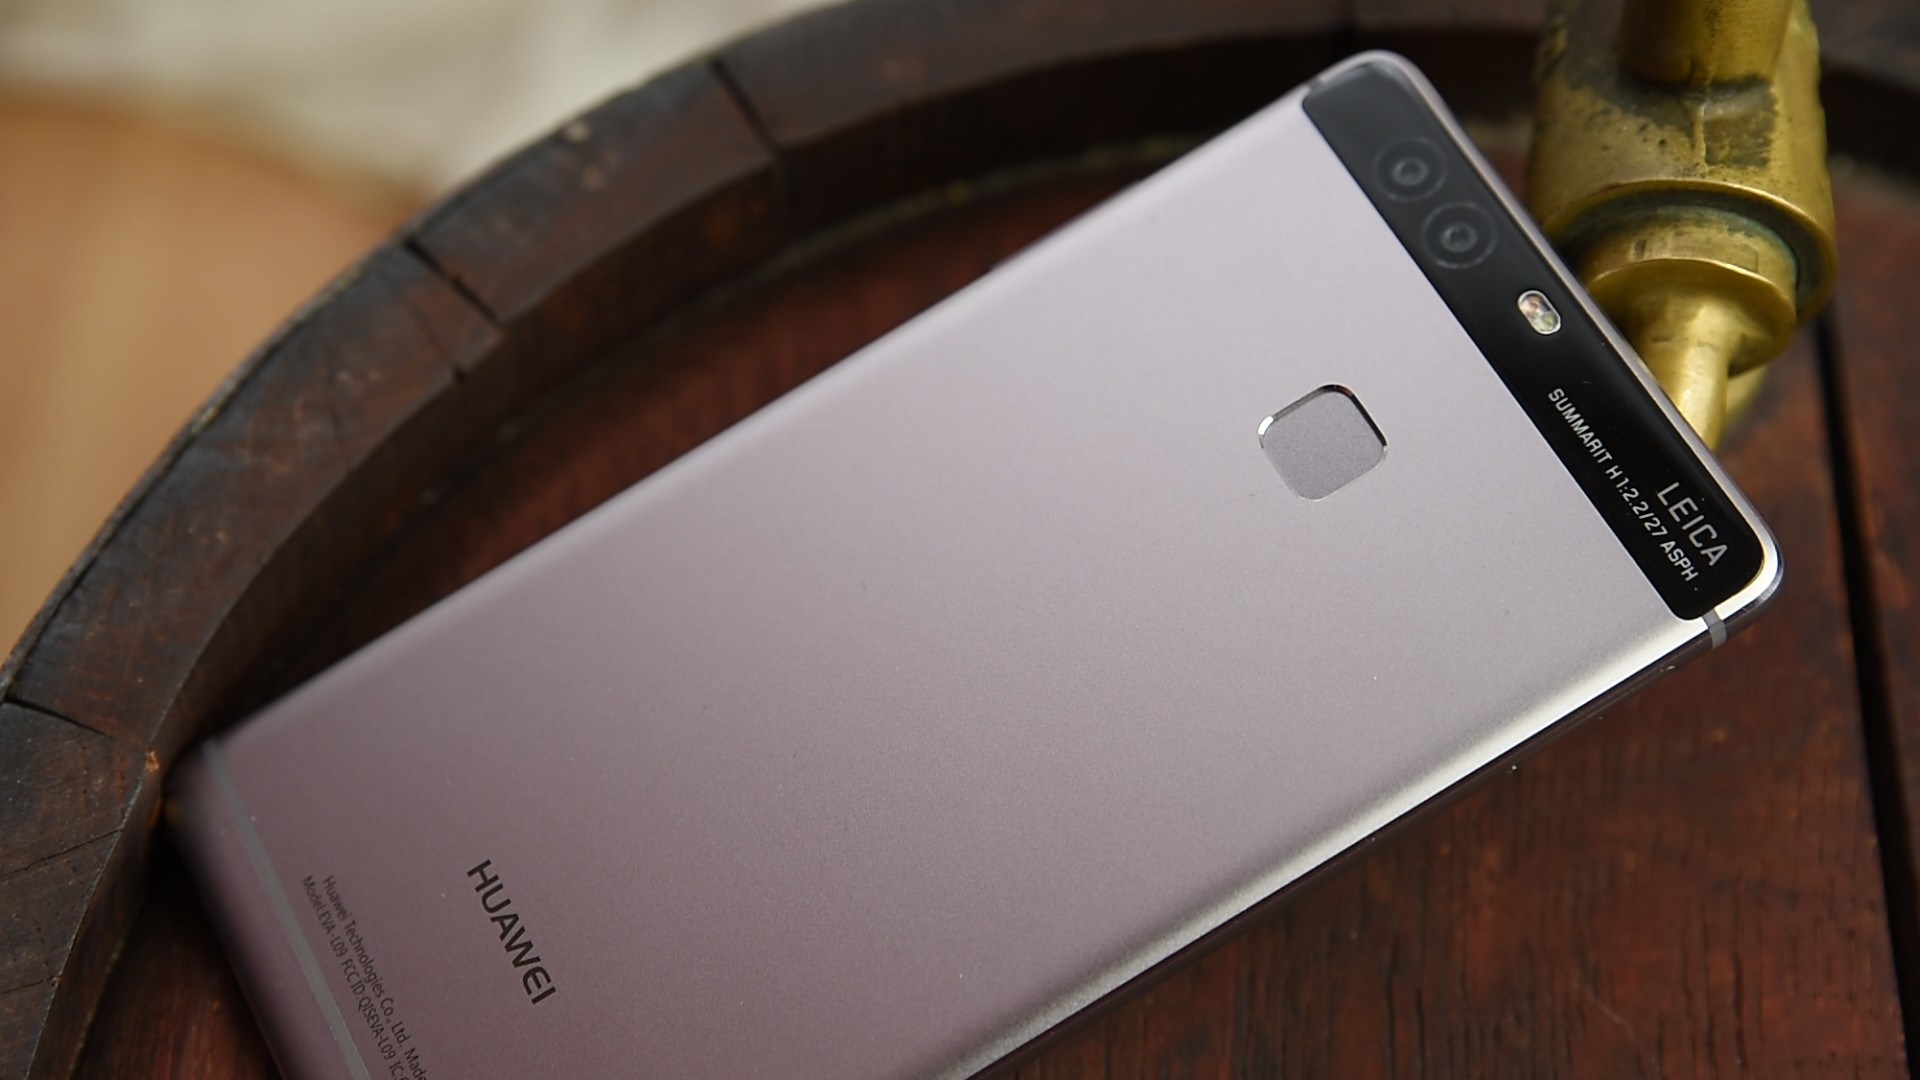 Huawei-p9-recenzja-10